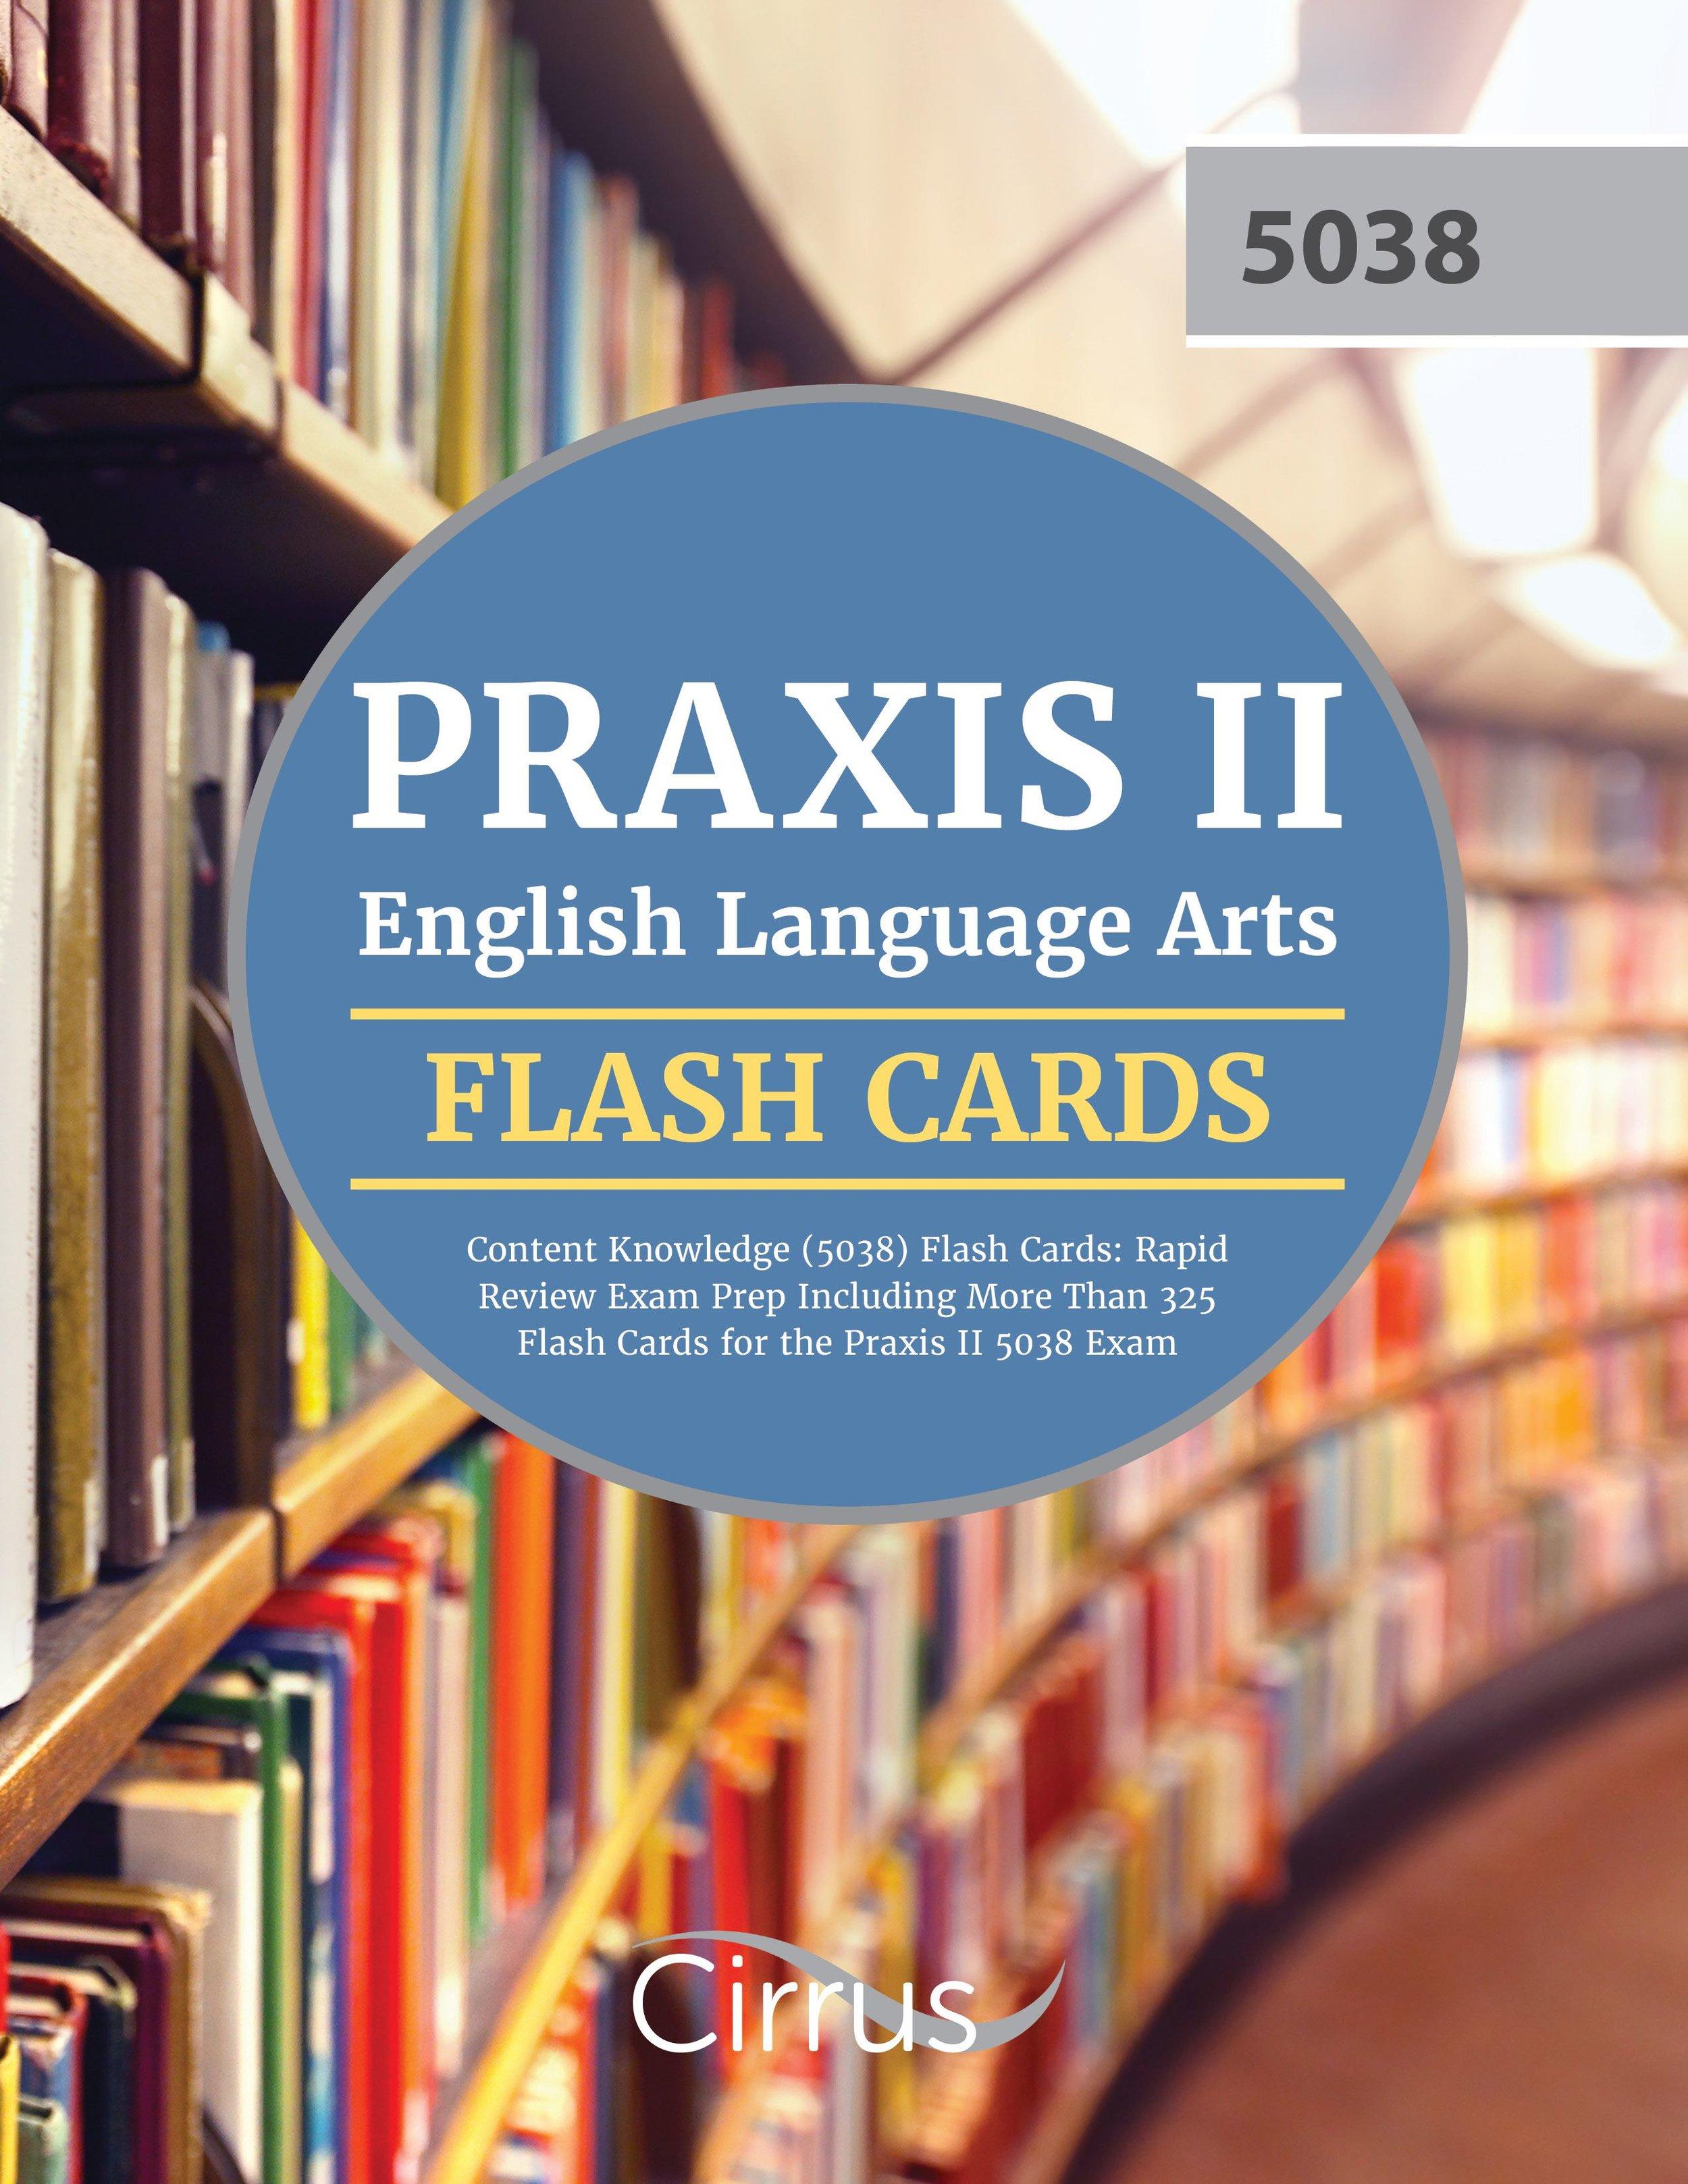 Praxis II English Language Arts ELA 5038 Content Knowledge Flash Cards Exam Prep